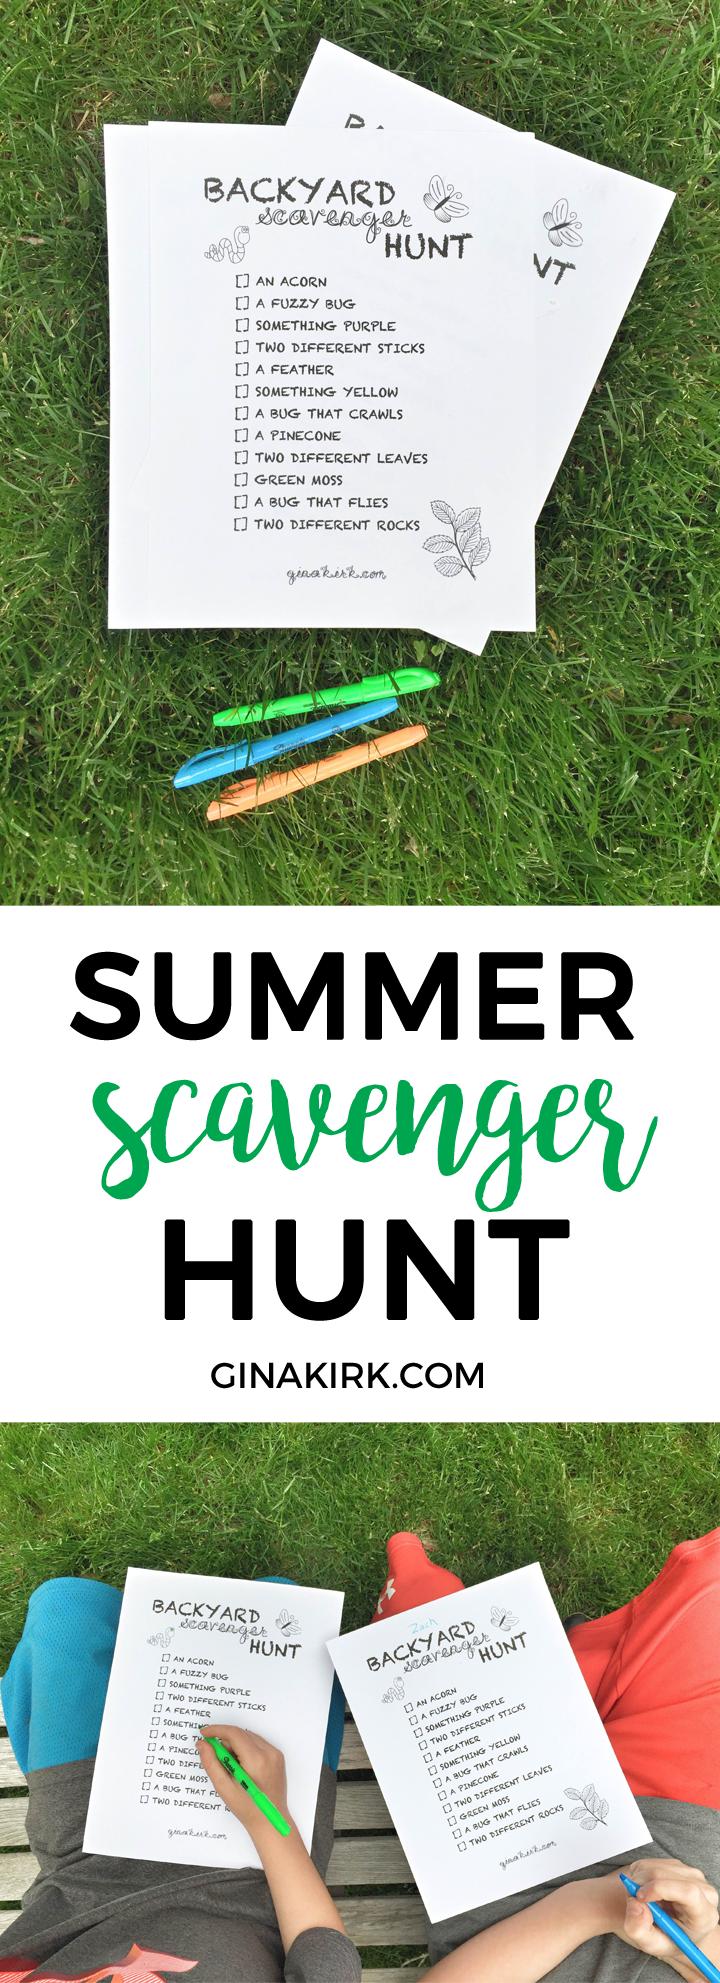 Backyard scavenger hunt | Free printable backyard nature hunt | Host a scavenger hunt ice cream party in your backyard! GinaKirk.com @ginaekirk